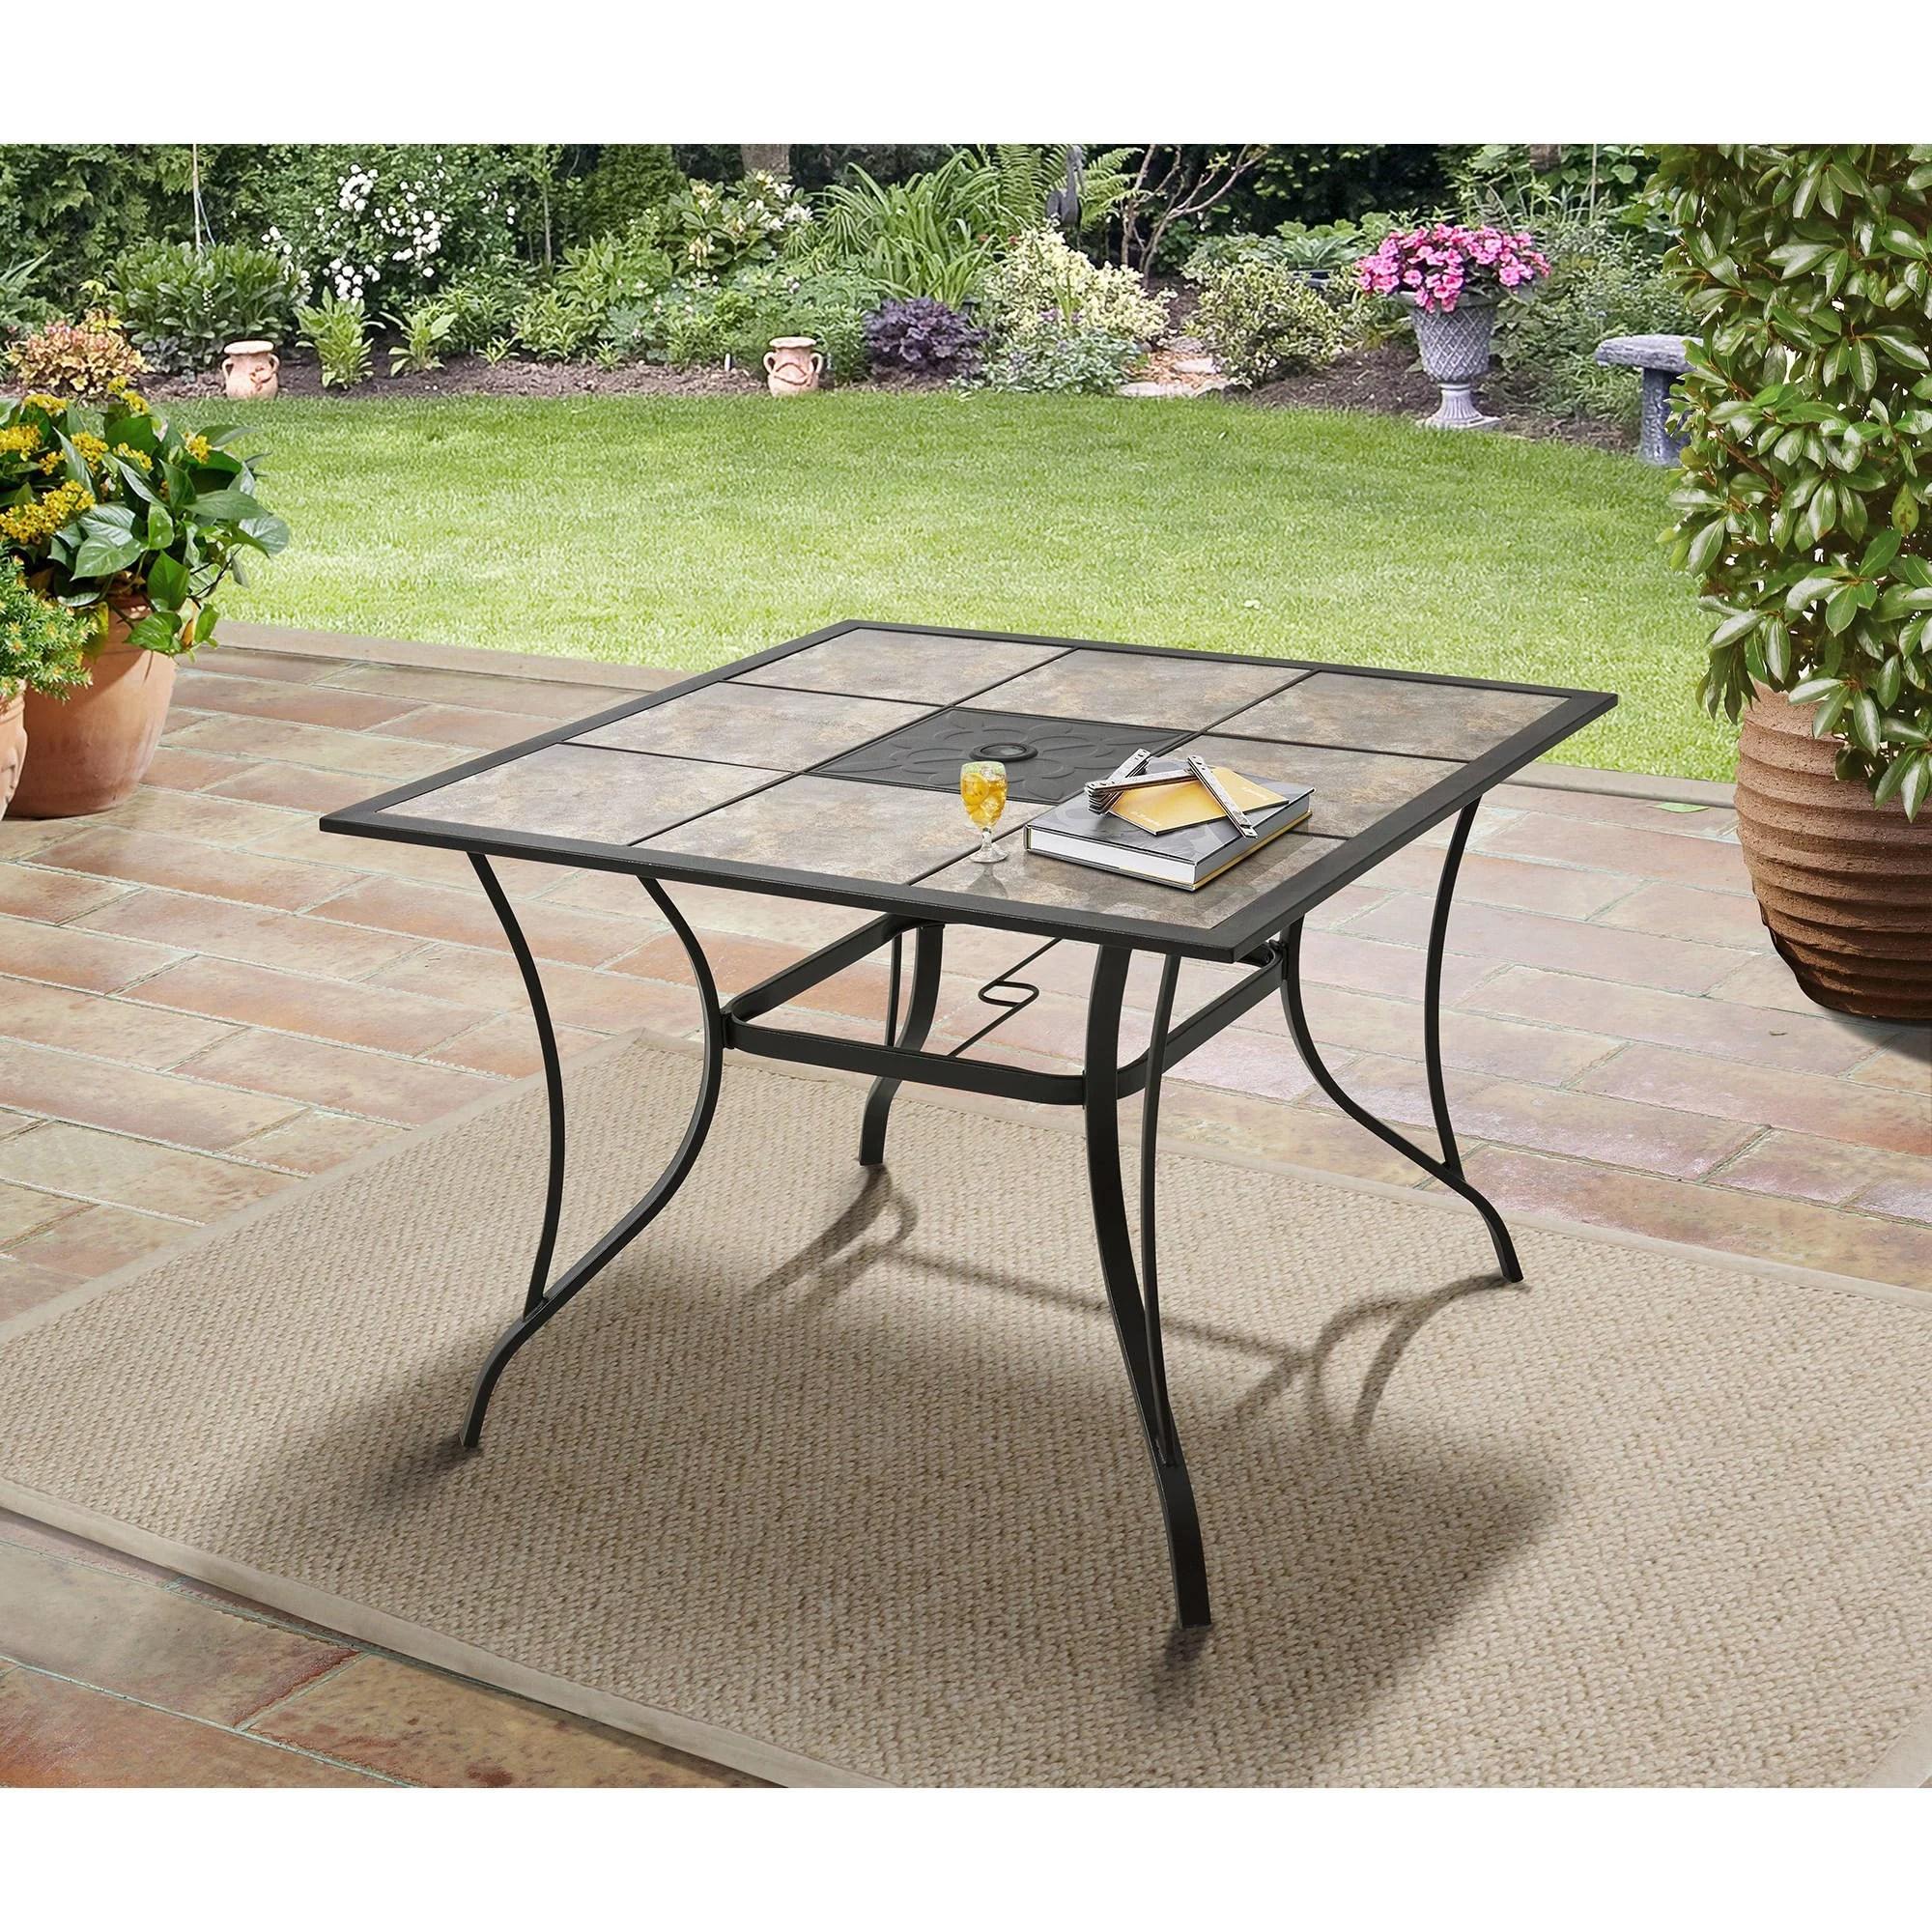 mainstays heritage park 40 tiled patio dining table walmart com